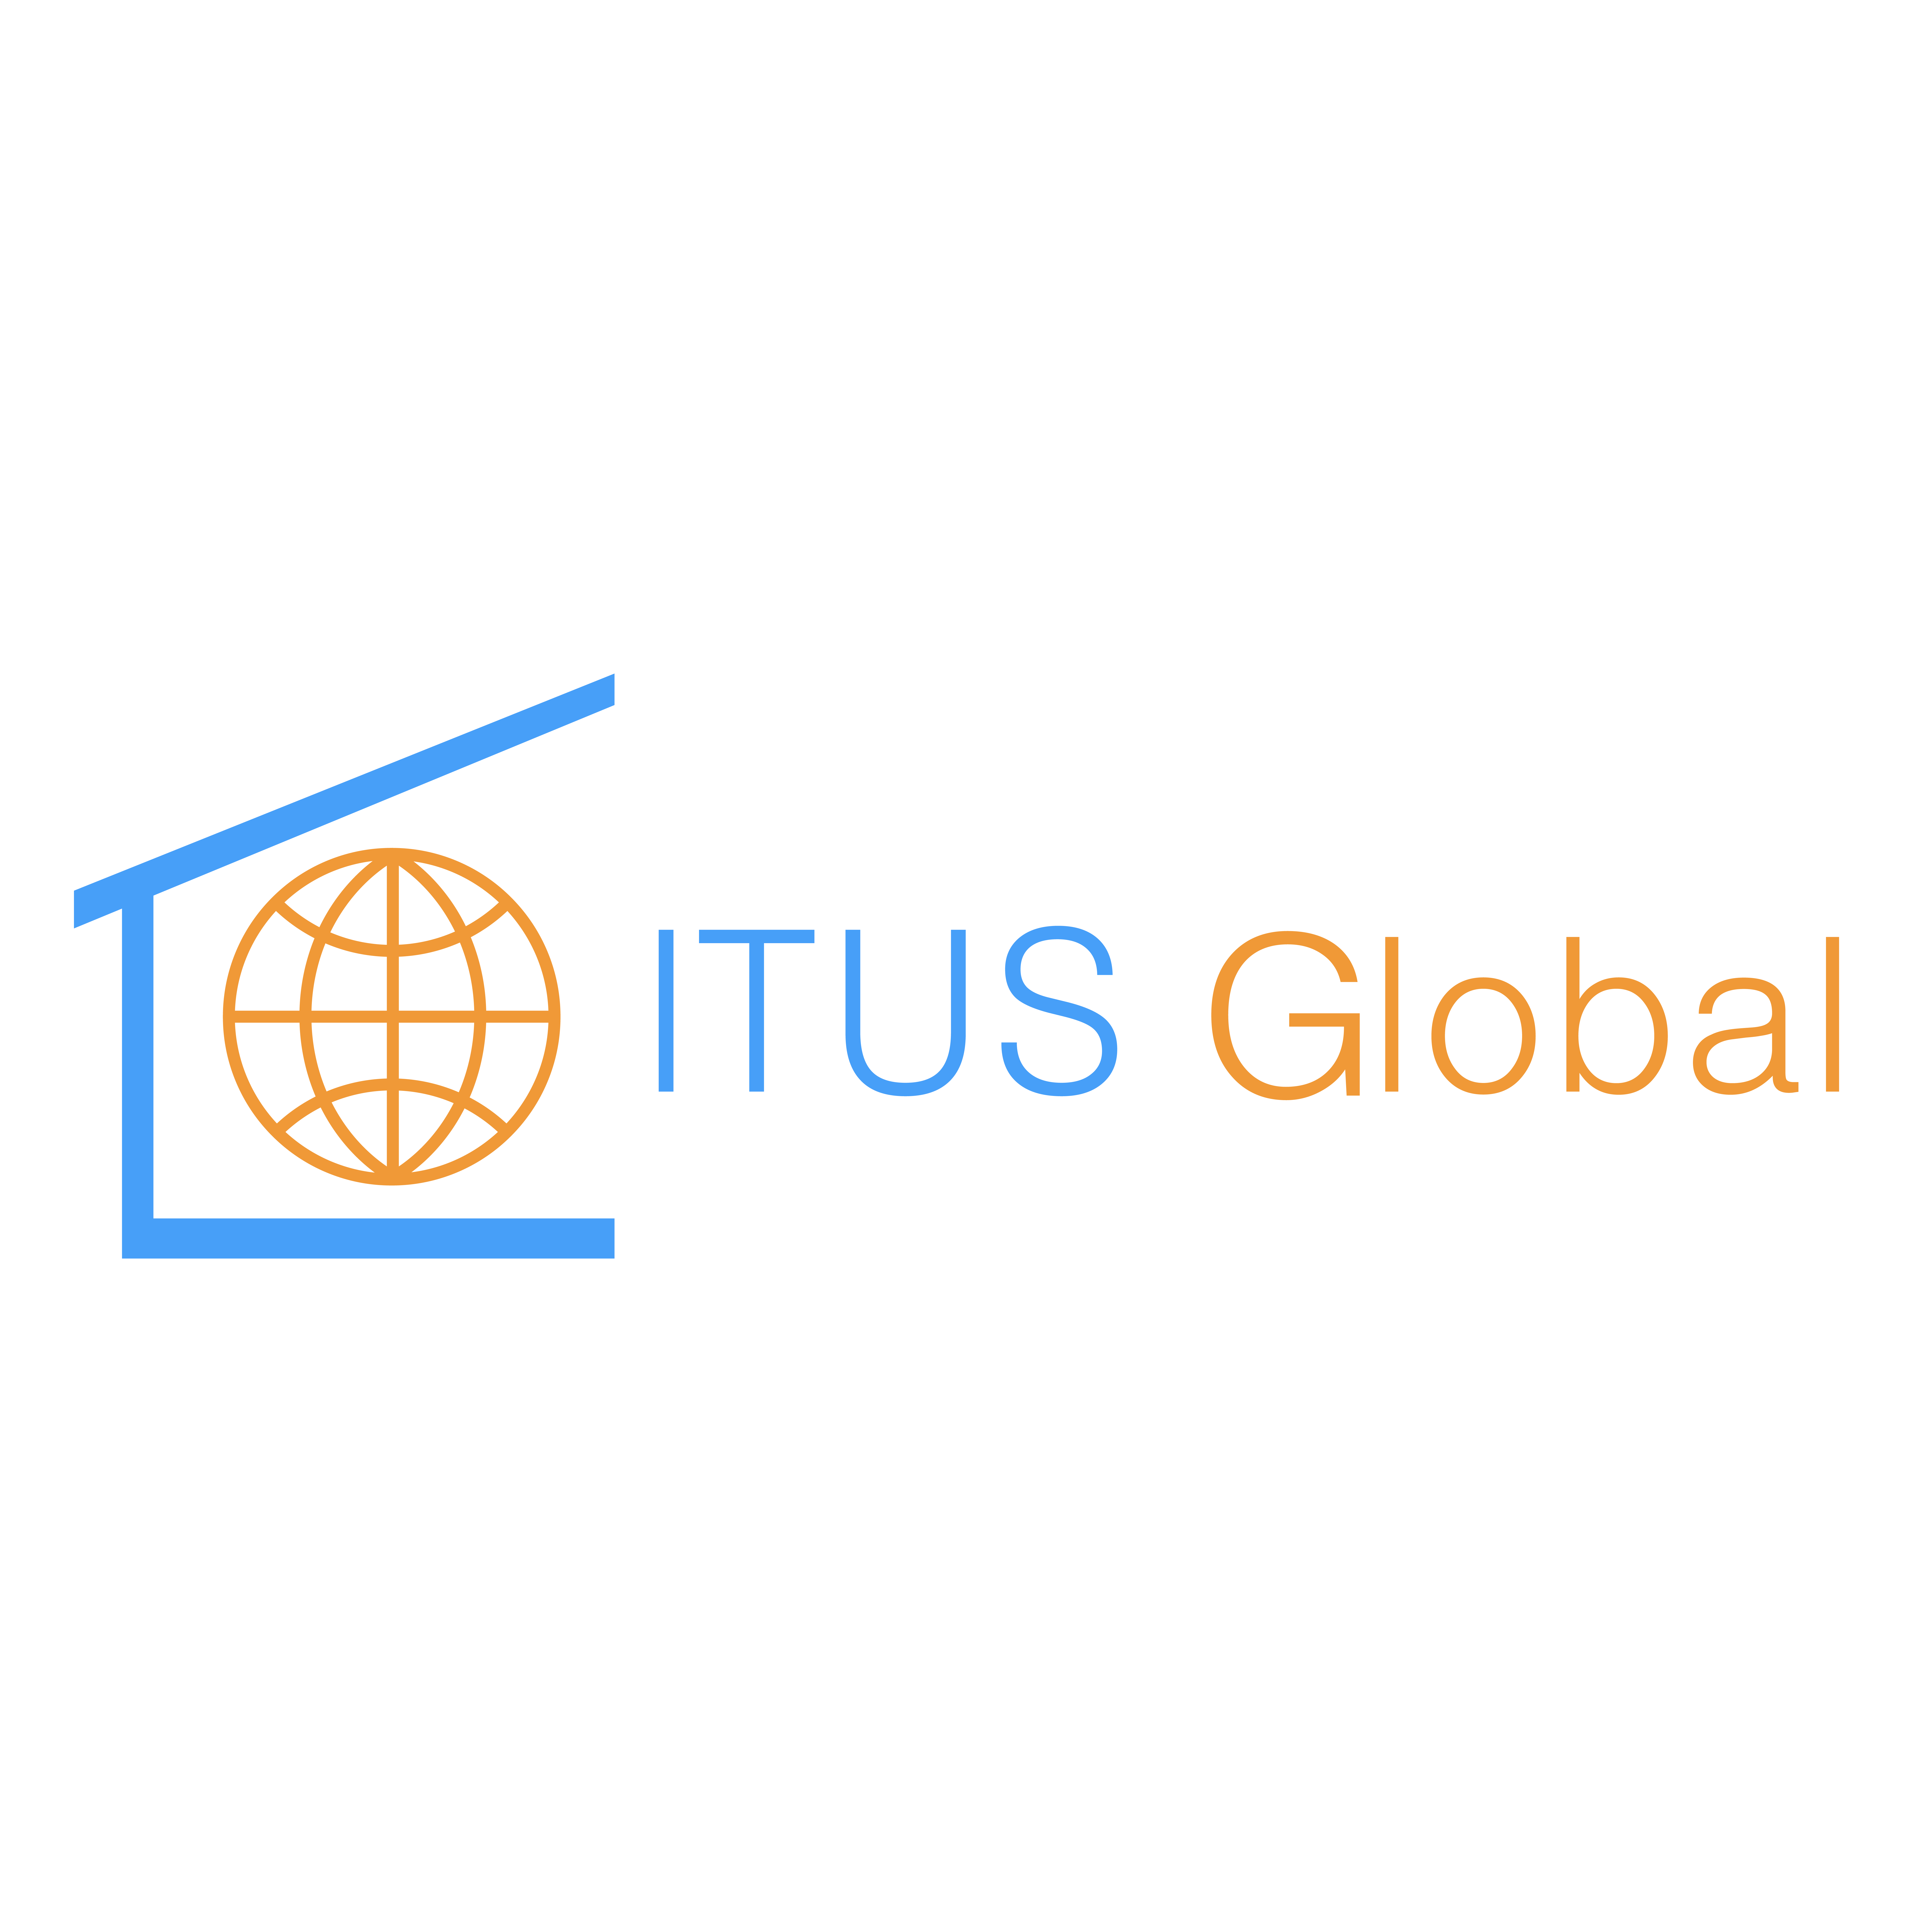 ITUS Global logo on grey background